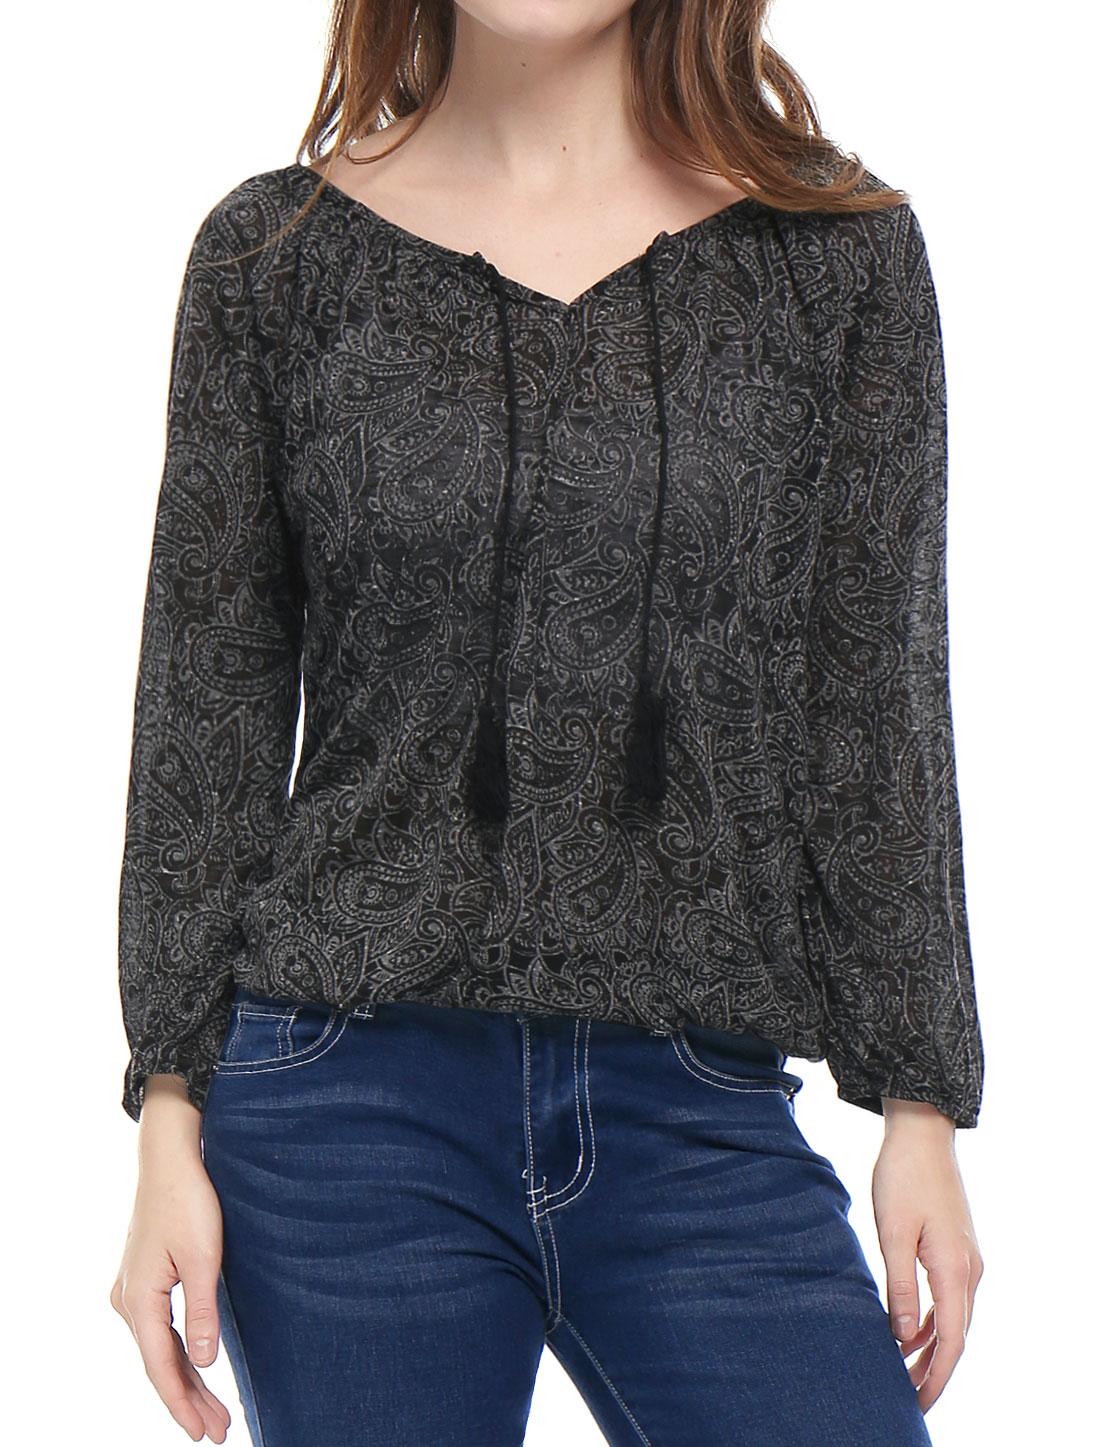 Allegra K Woman Paisley Pattern Jacquard Tasseled Ties Peasant Blouse Black XL